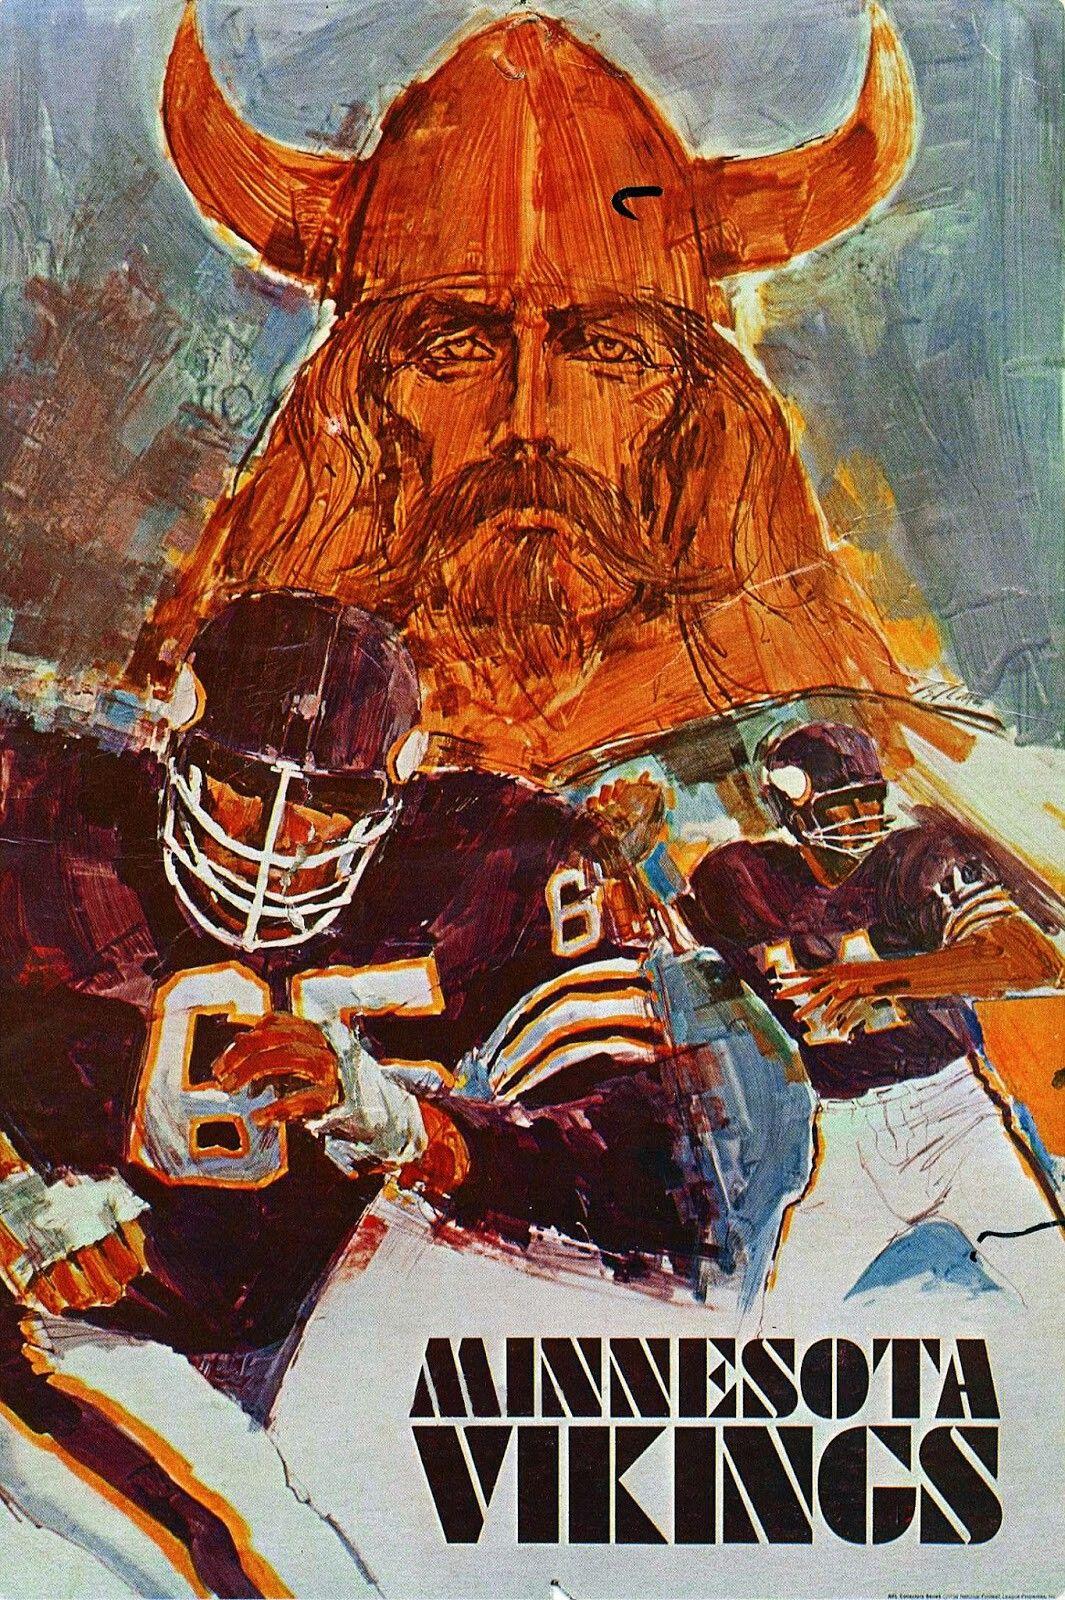 b1d26767a 1968 Minnesota Vikings Poster Redskins Football